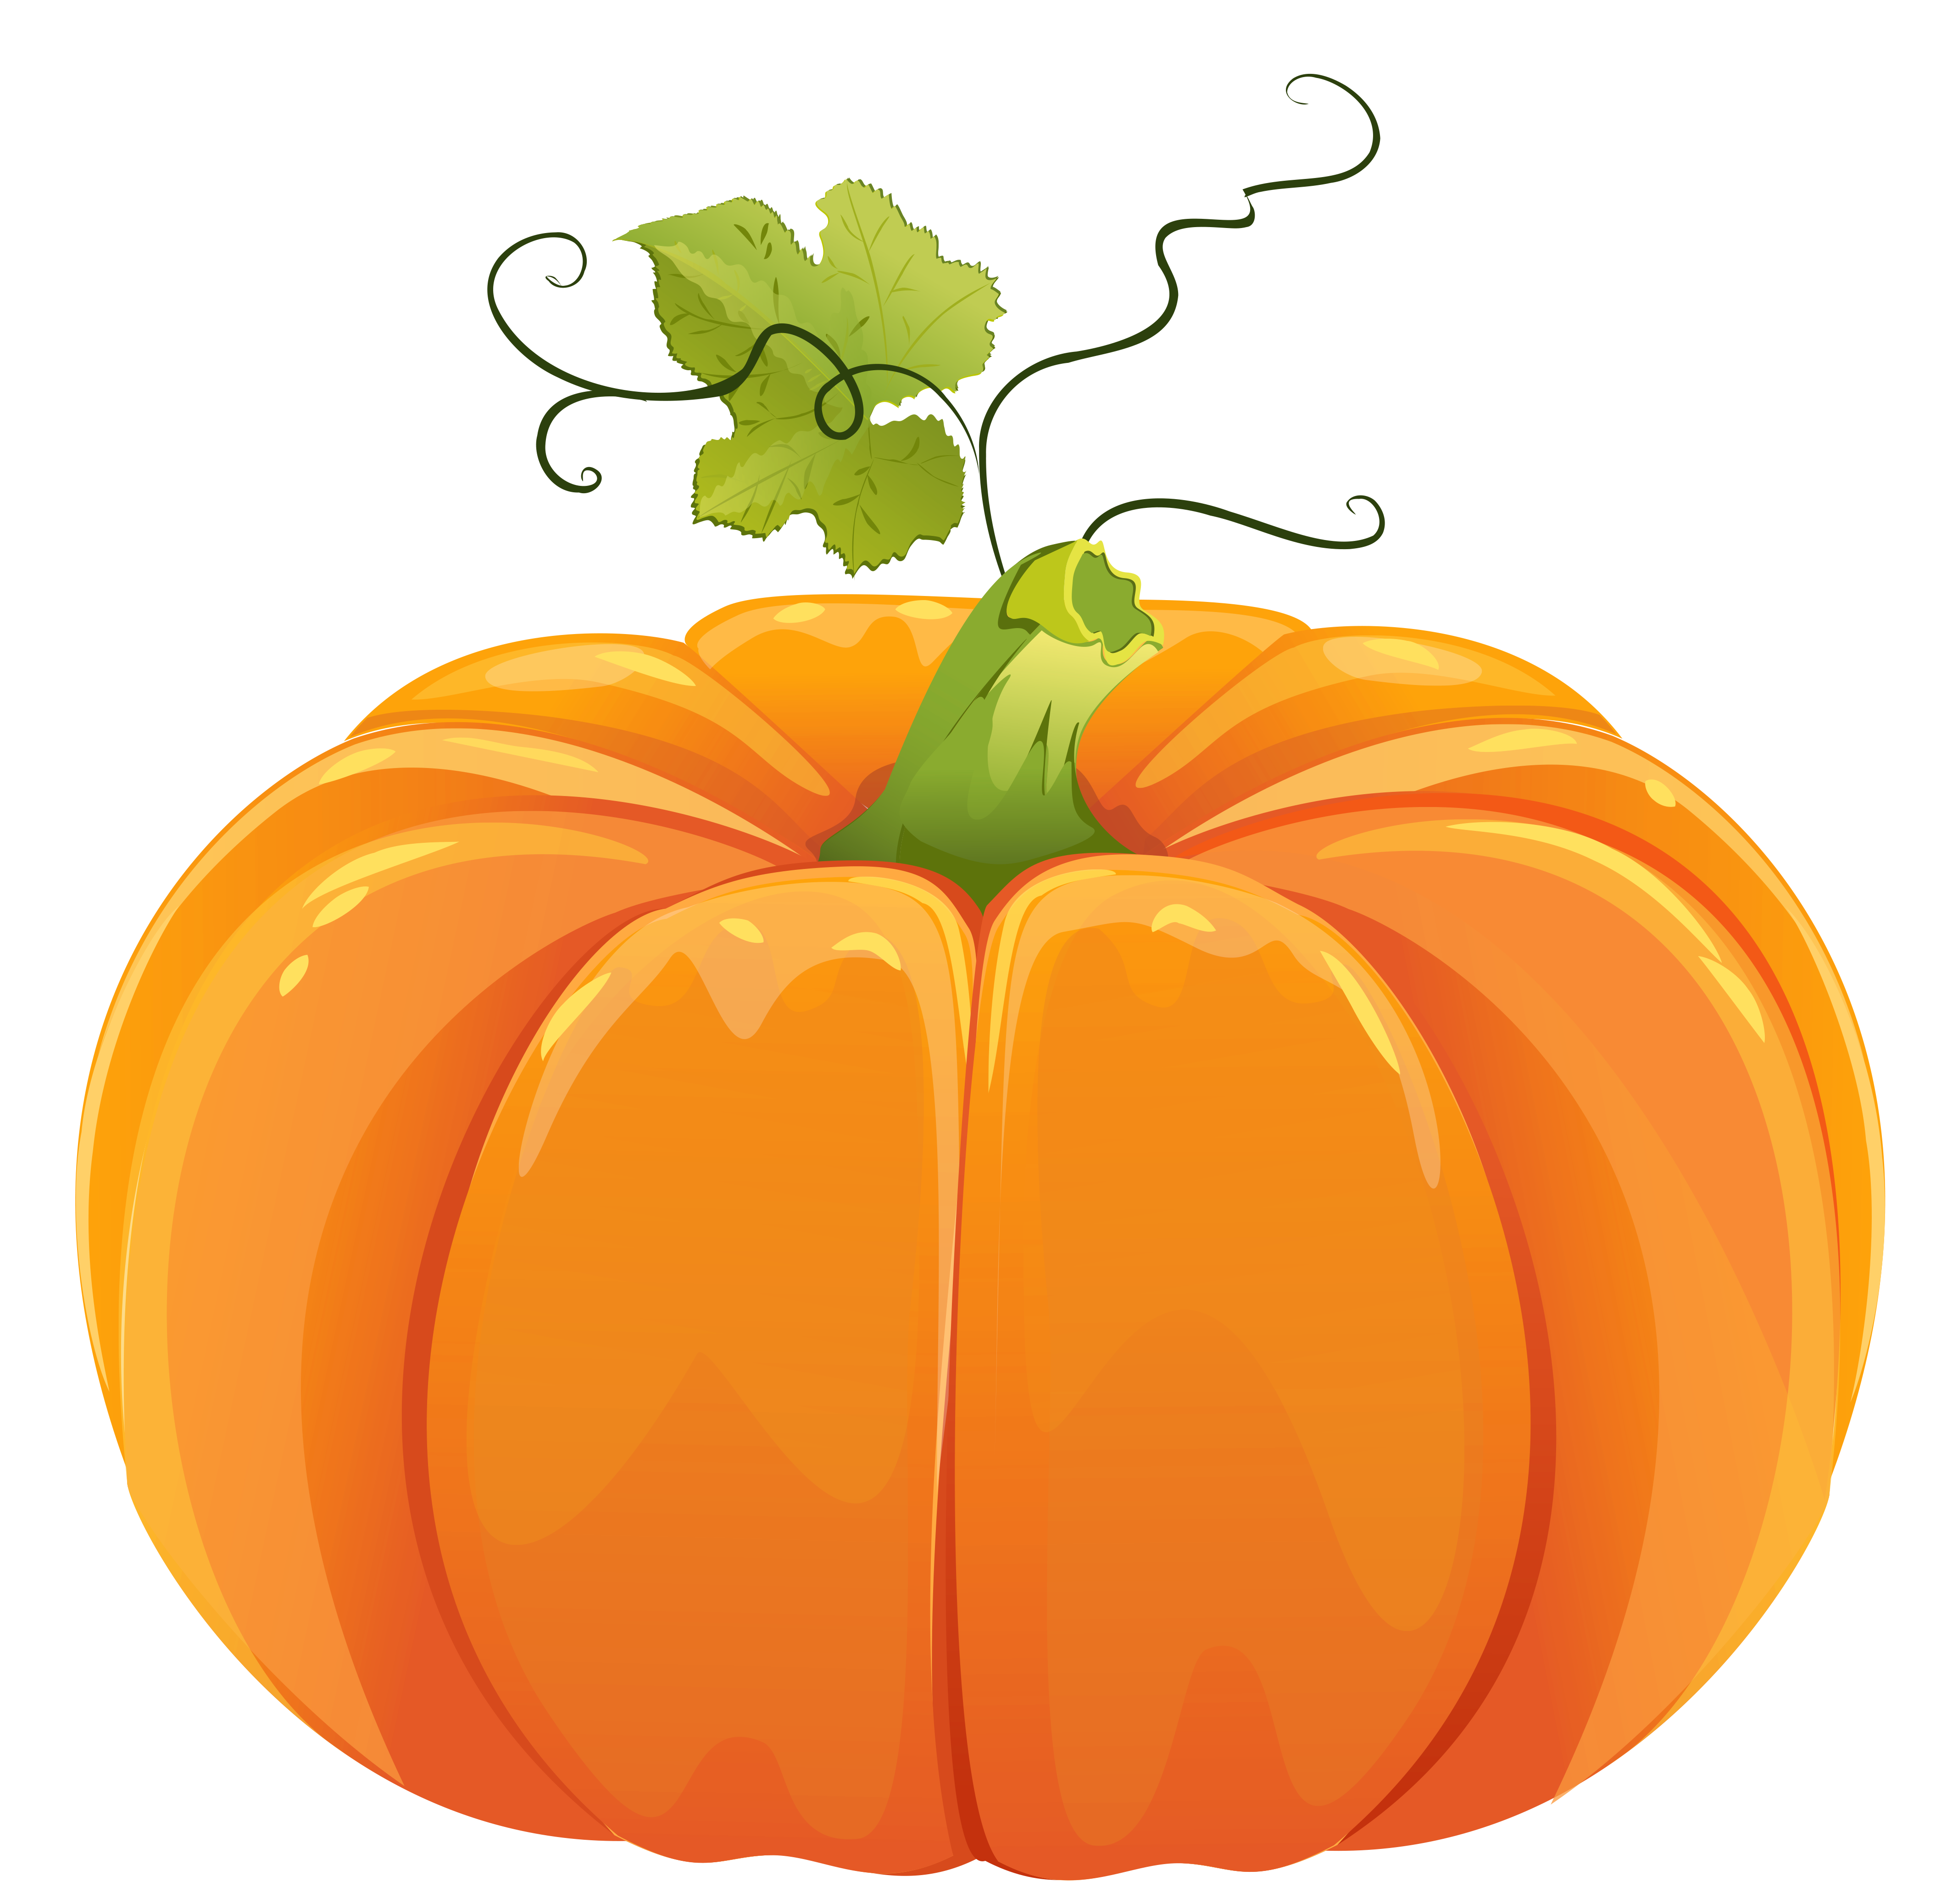 Free Clipart Pumpkins - clipartall-Free Clipart Pumpkins - clipartall-9